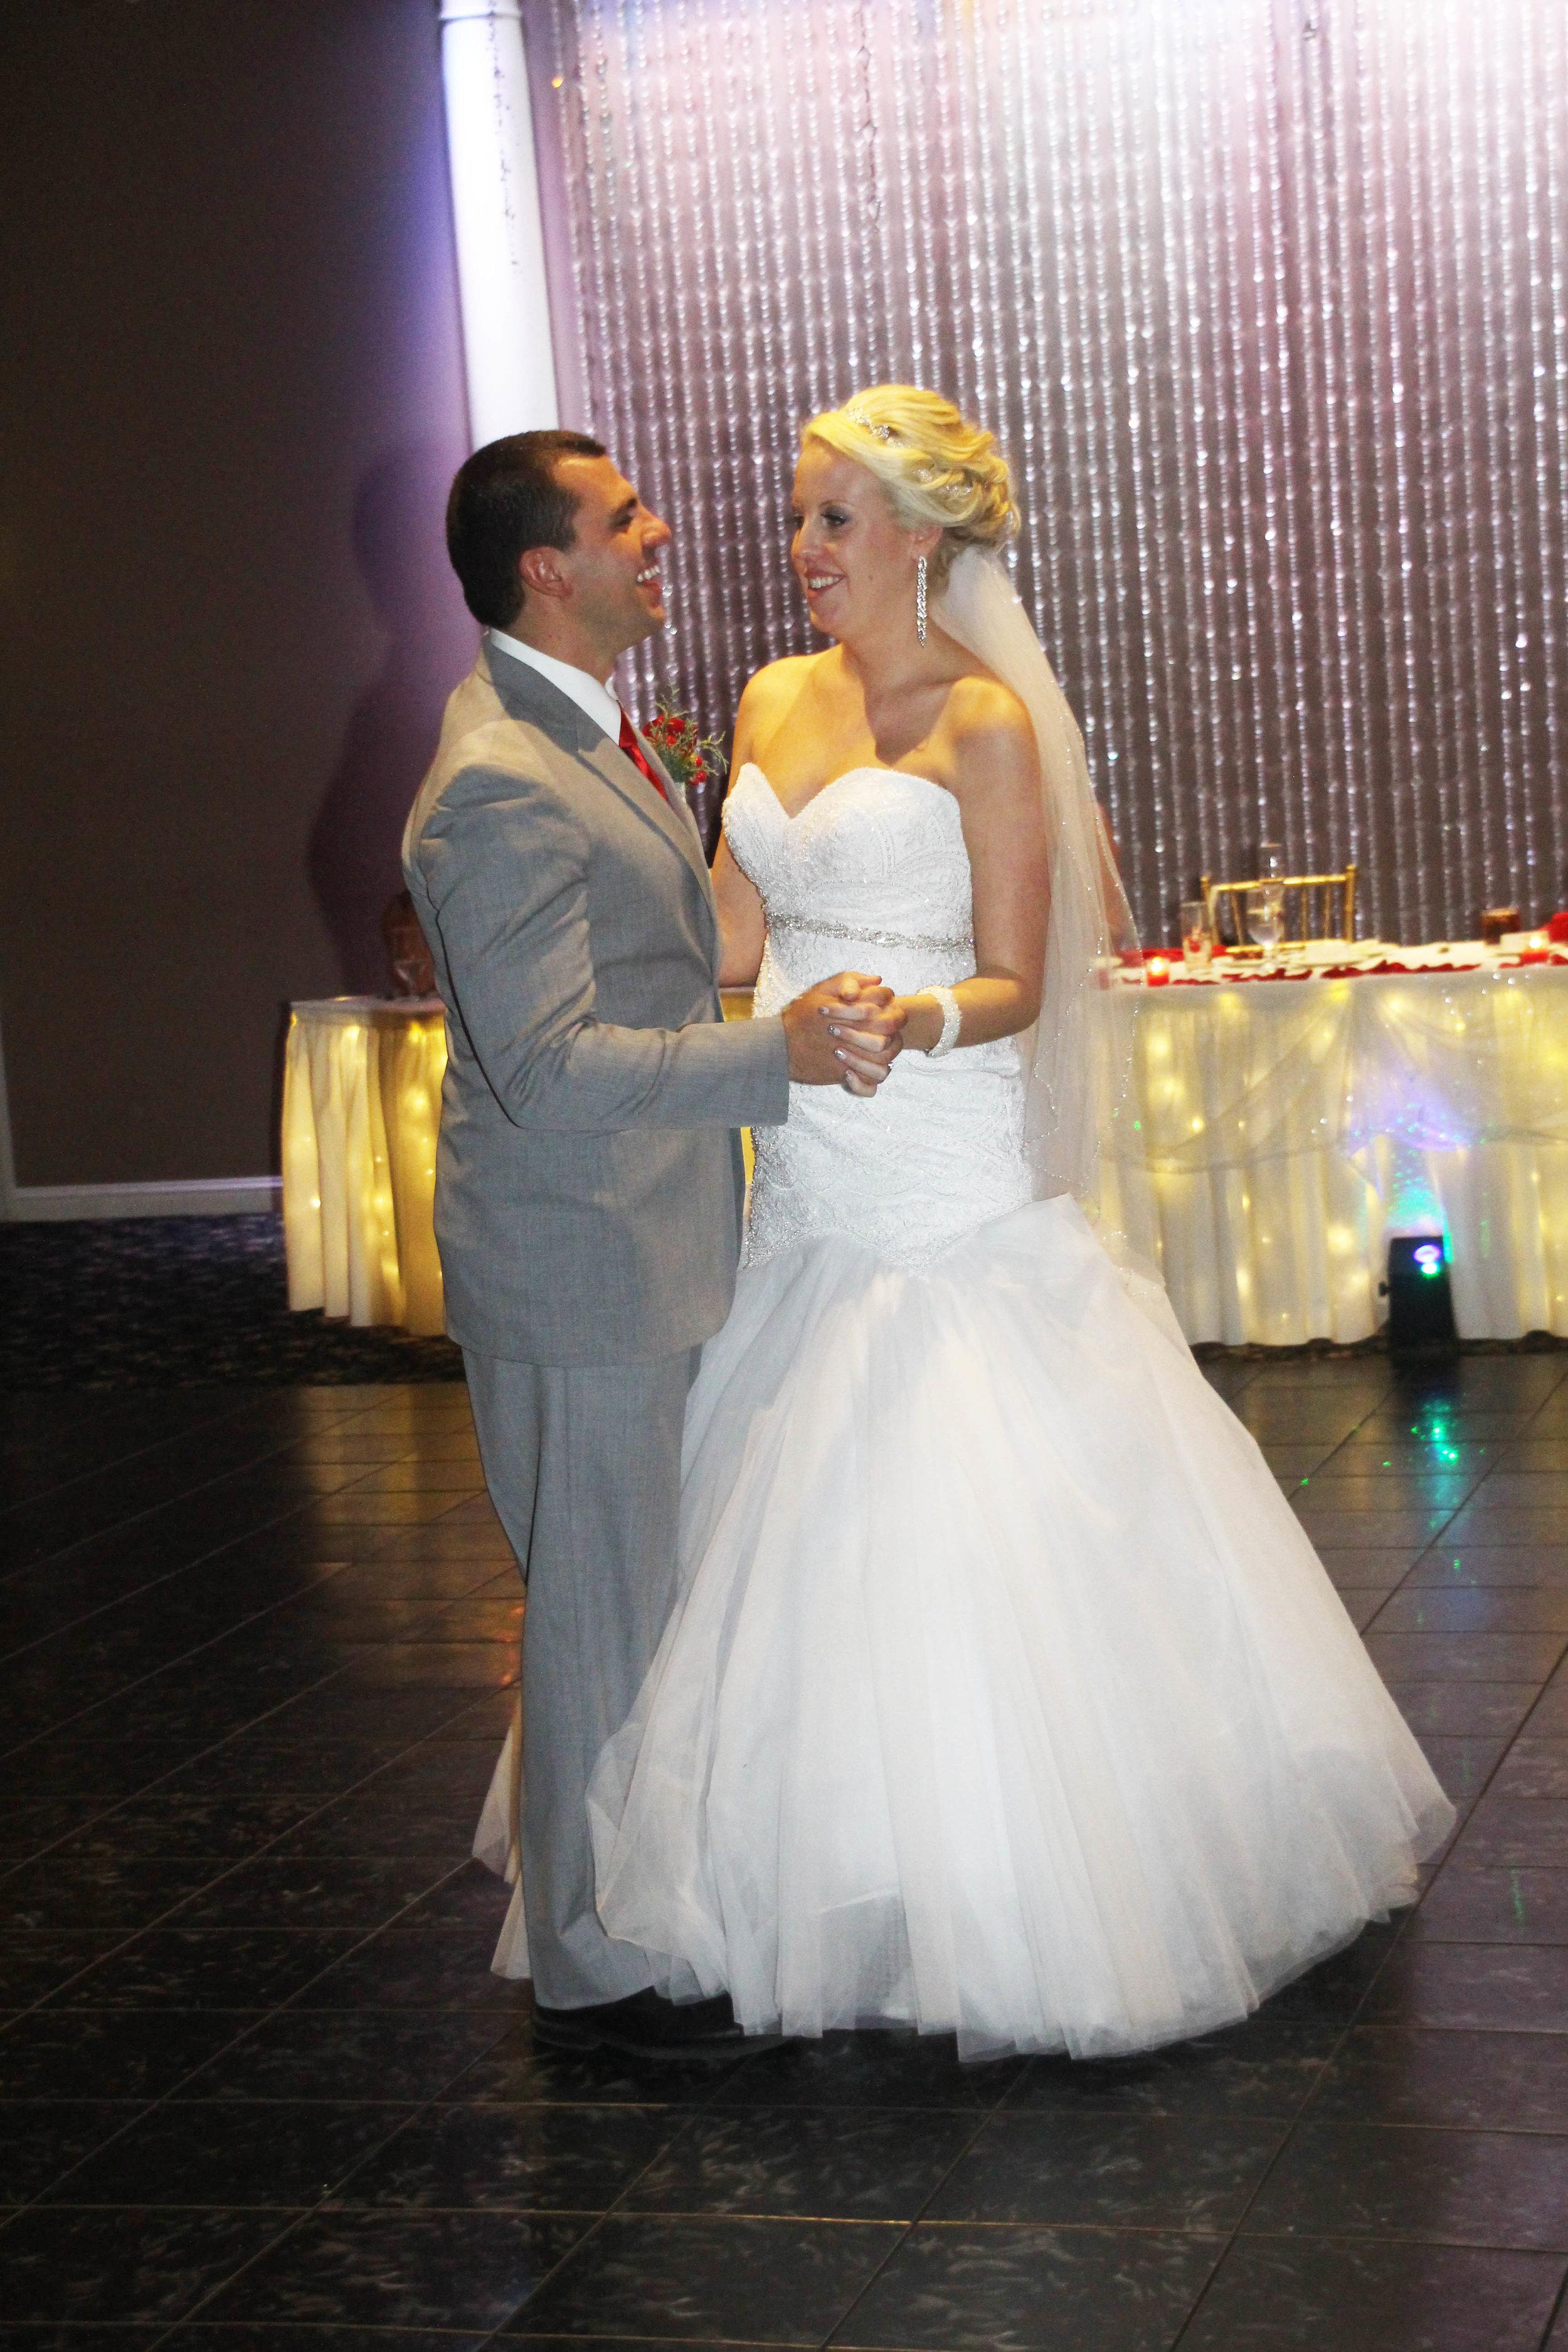 Congratulations Hannah & Dominic!